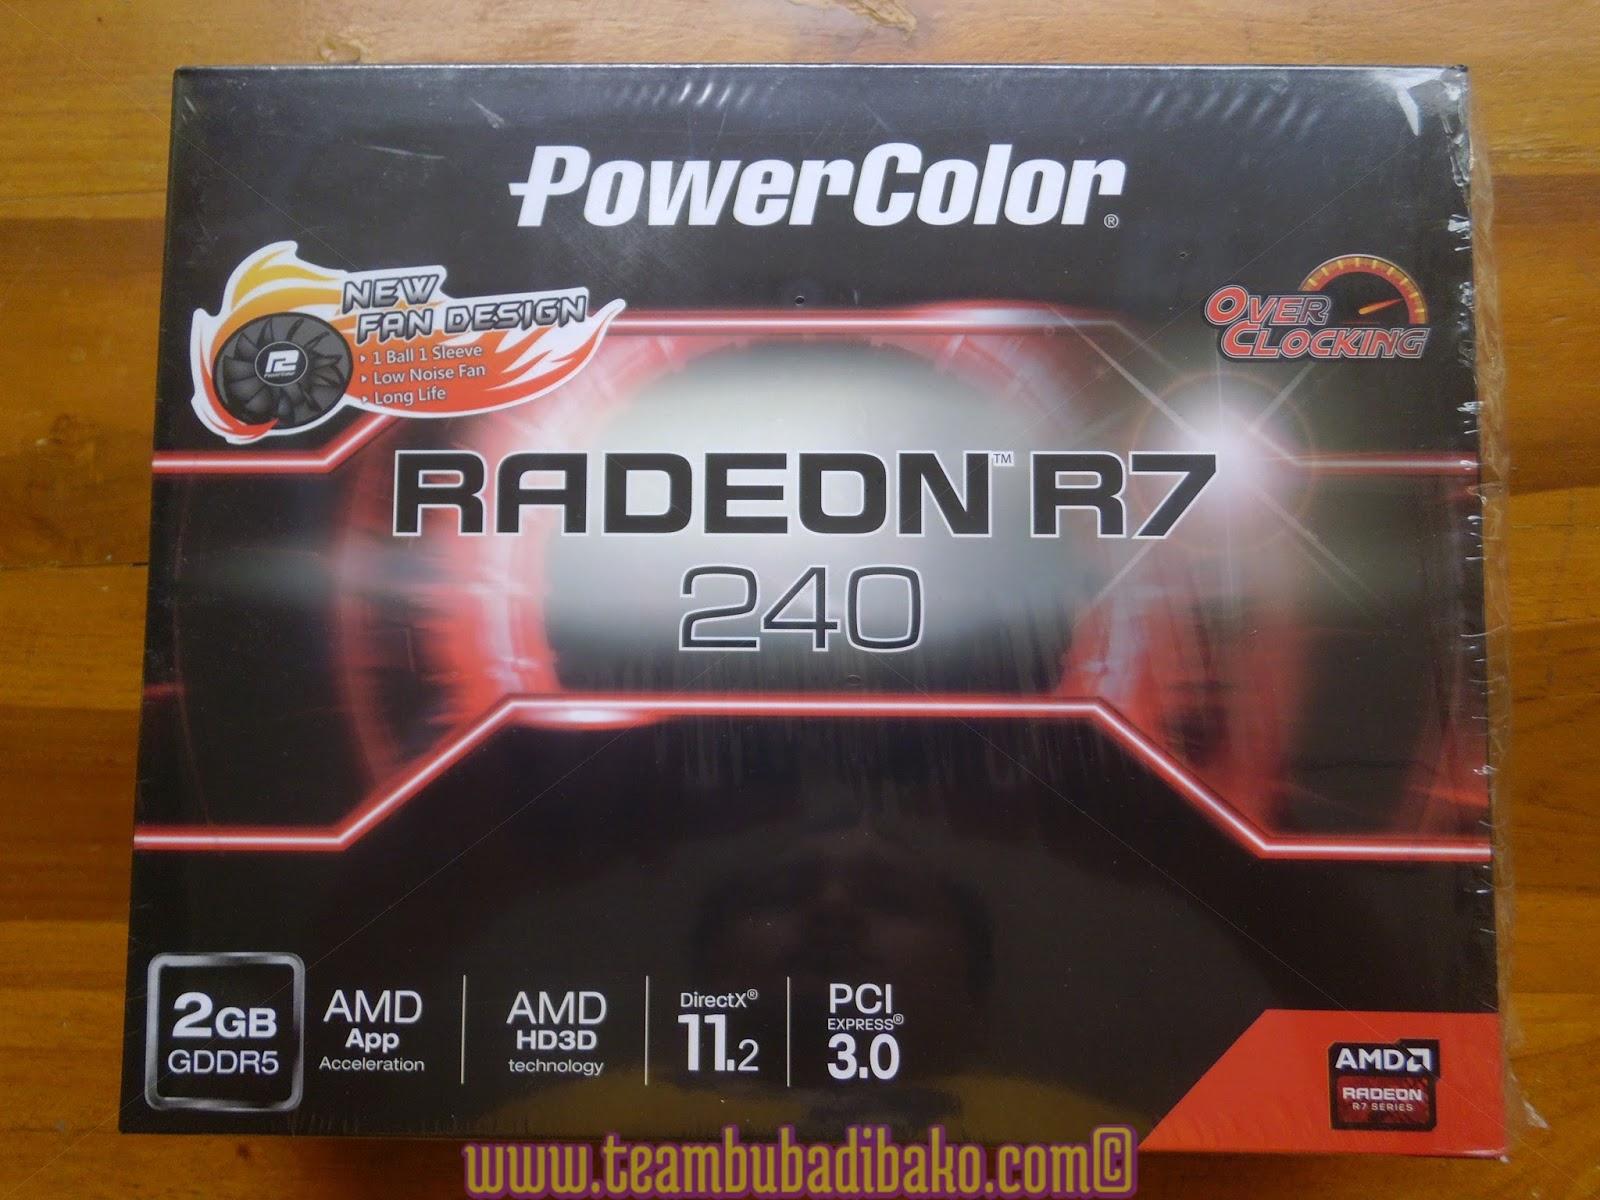 Unboxing Powercolor Amd Radeon R7 240 2gb Gddr5 Dan Test Kekuatannya Vga His R7240 Ram 2 Gb Ddr5 128bit